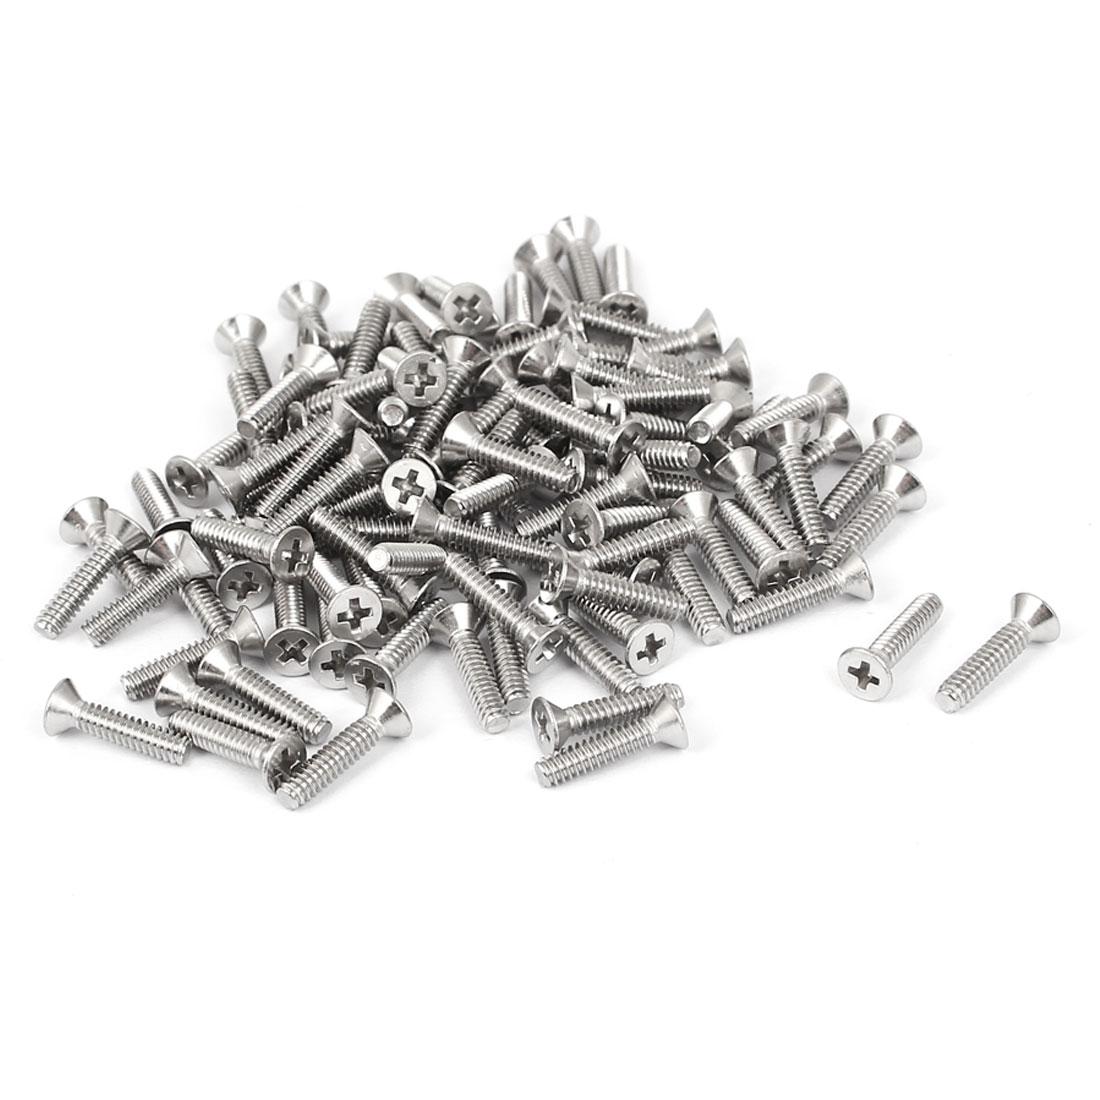 "4#-40x1/2"" Stainless Steel Phillips Flat Countersunk Head Machine Screws 100pcs"